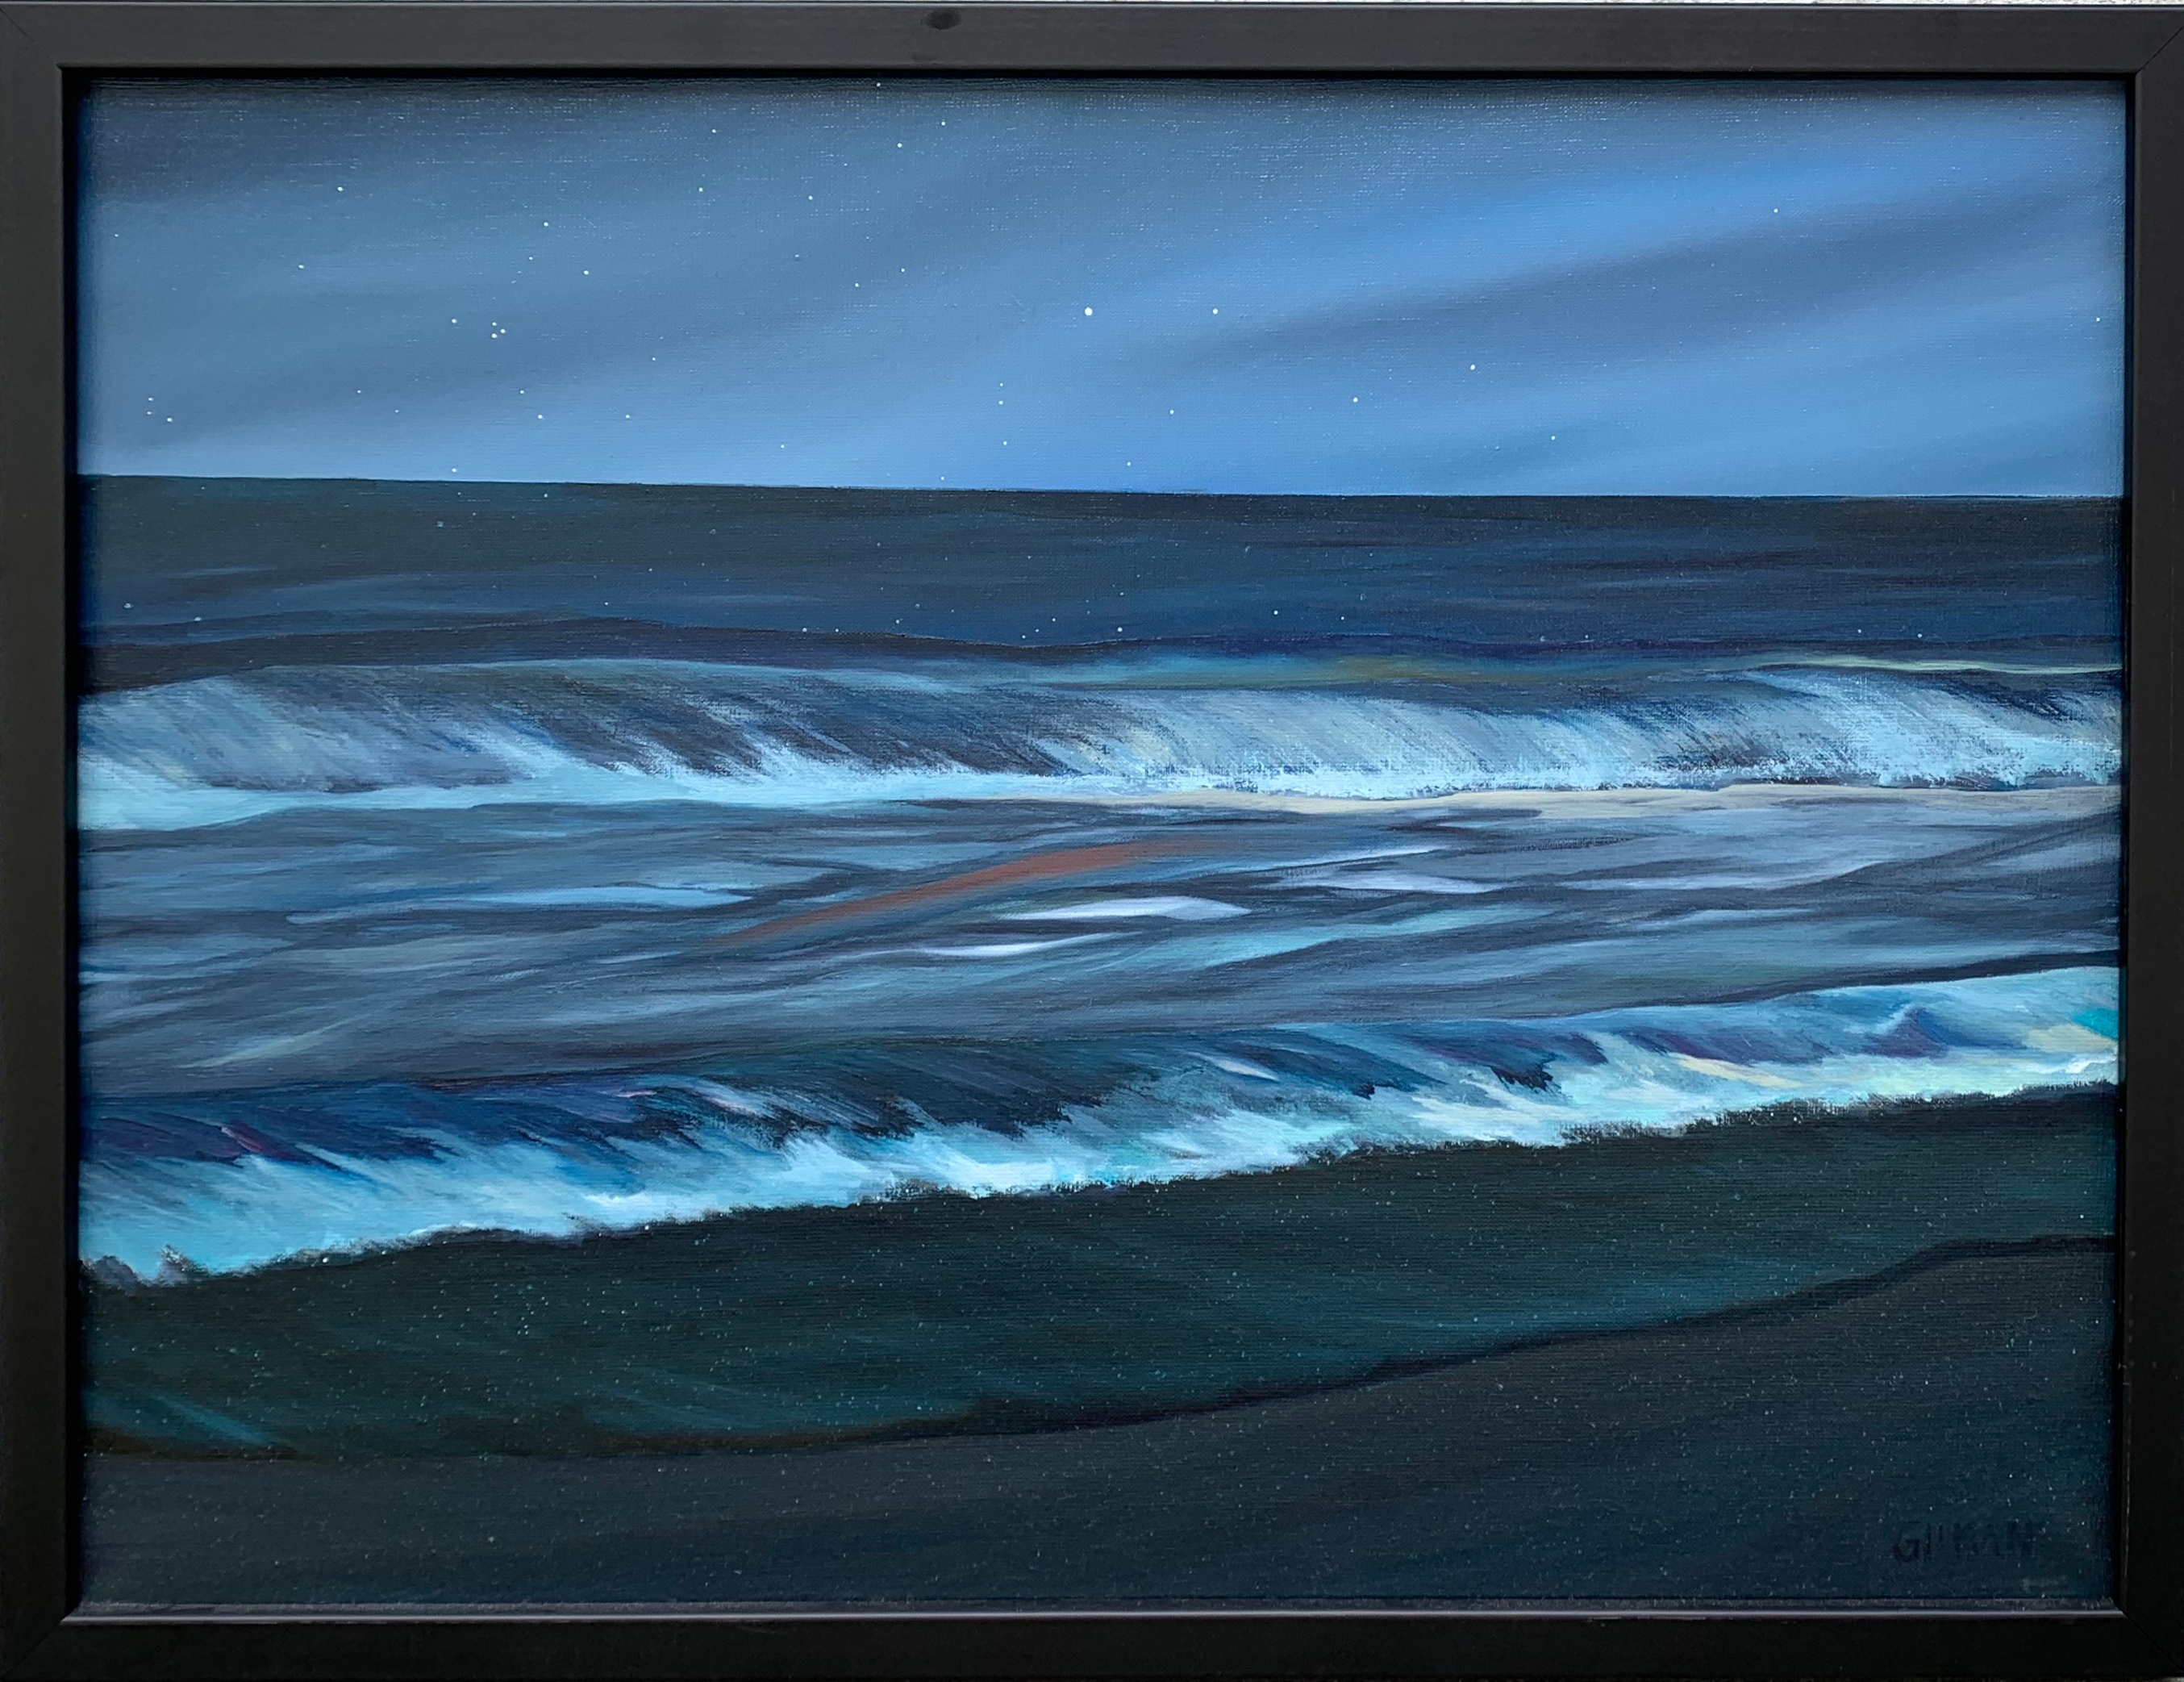 Ocean at dusk   framed ure9ps